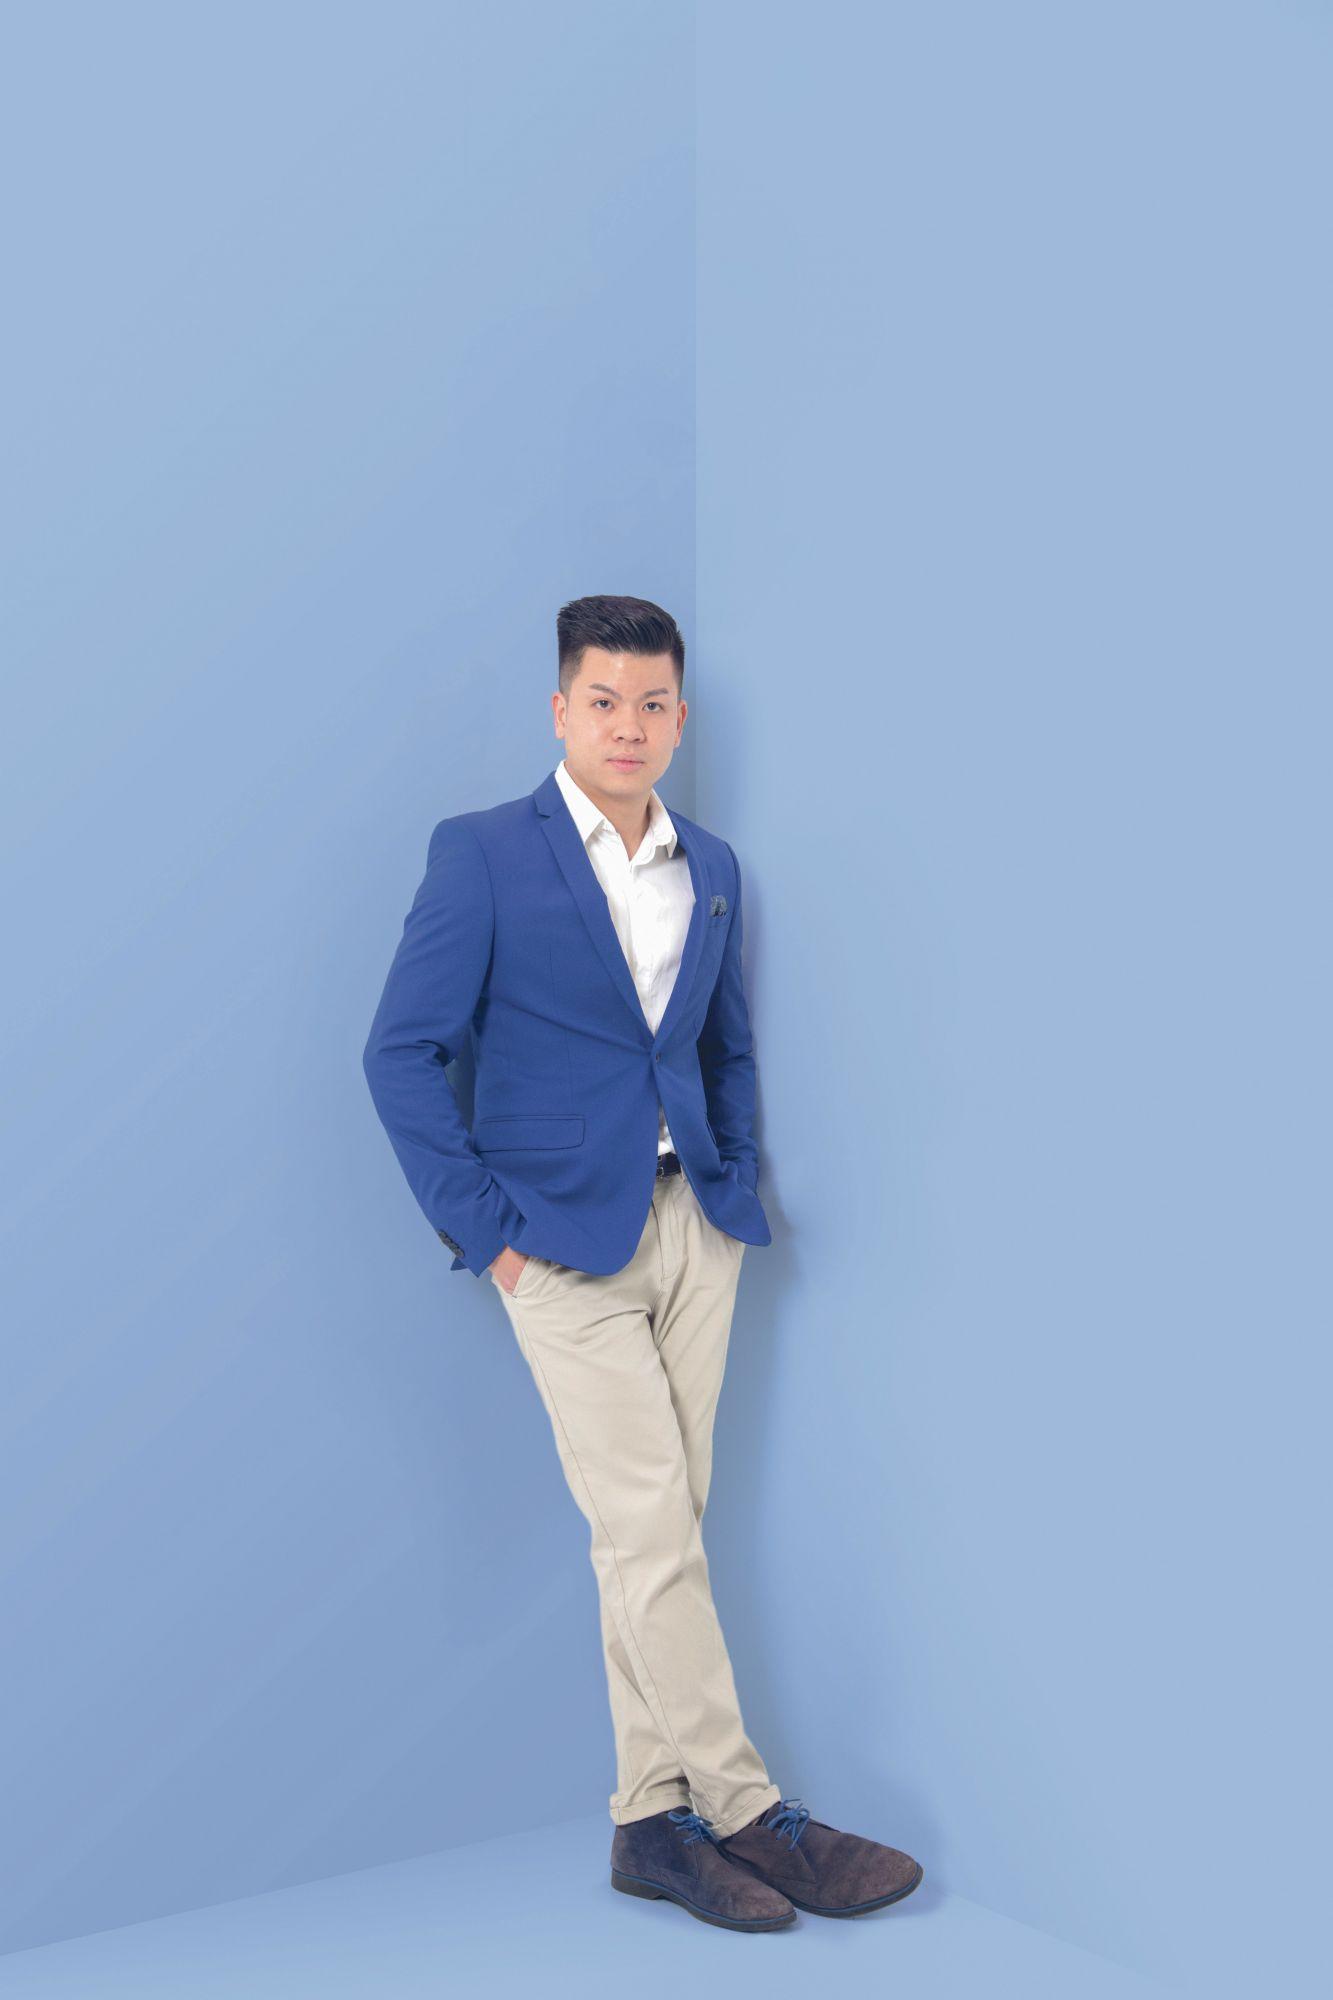 Tan Yong Meng